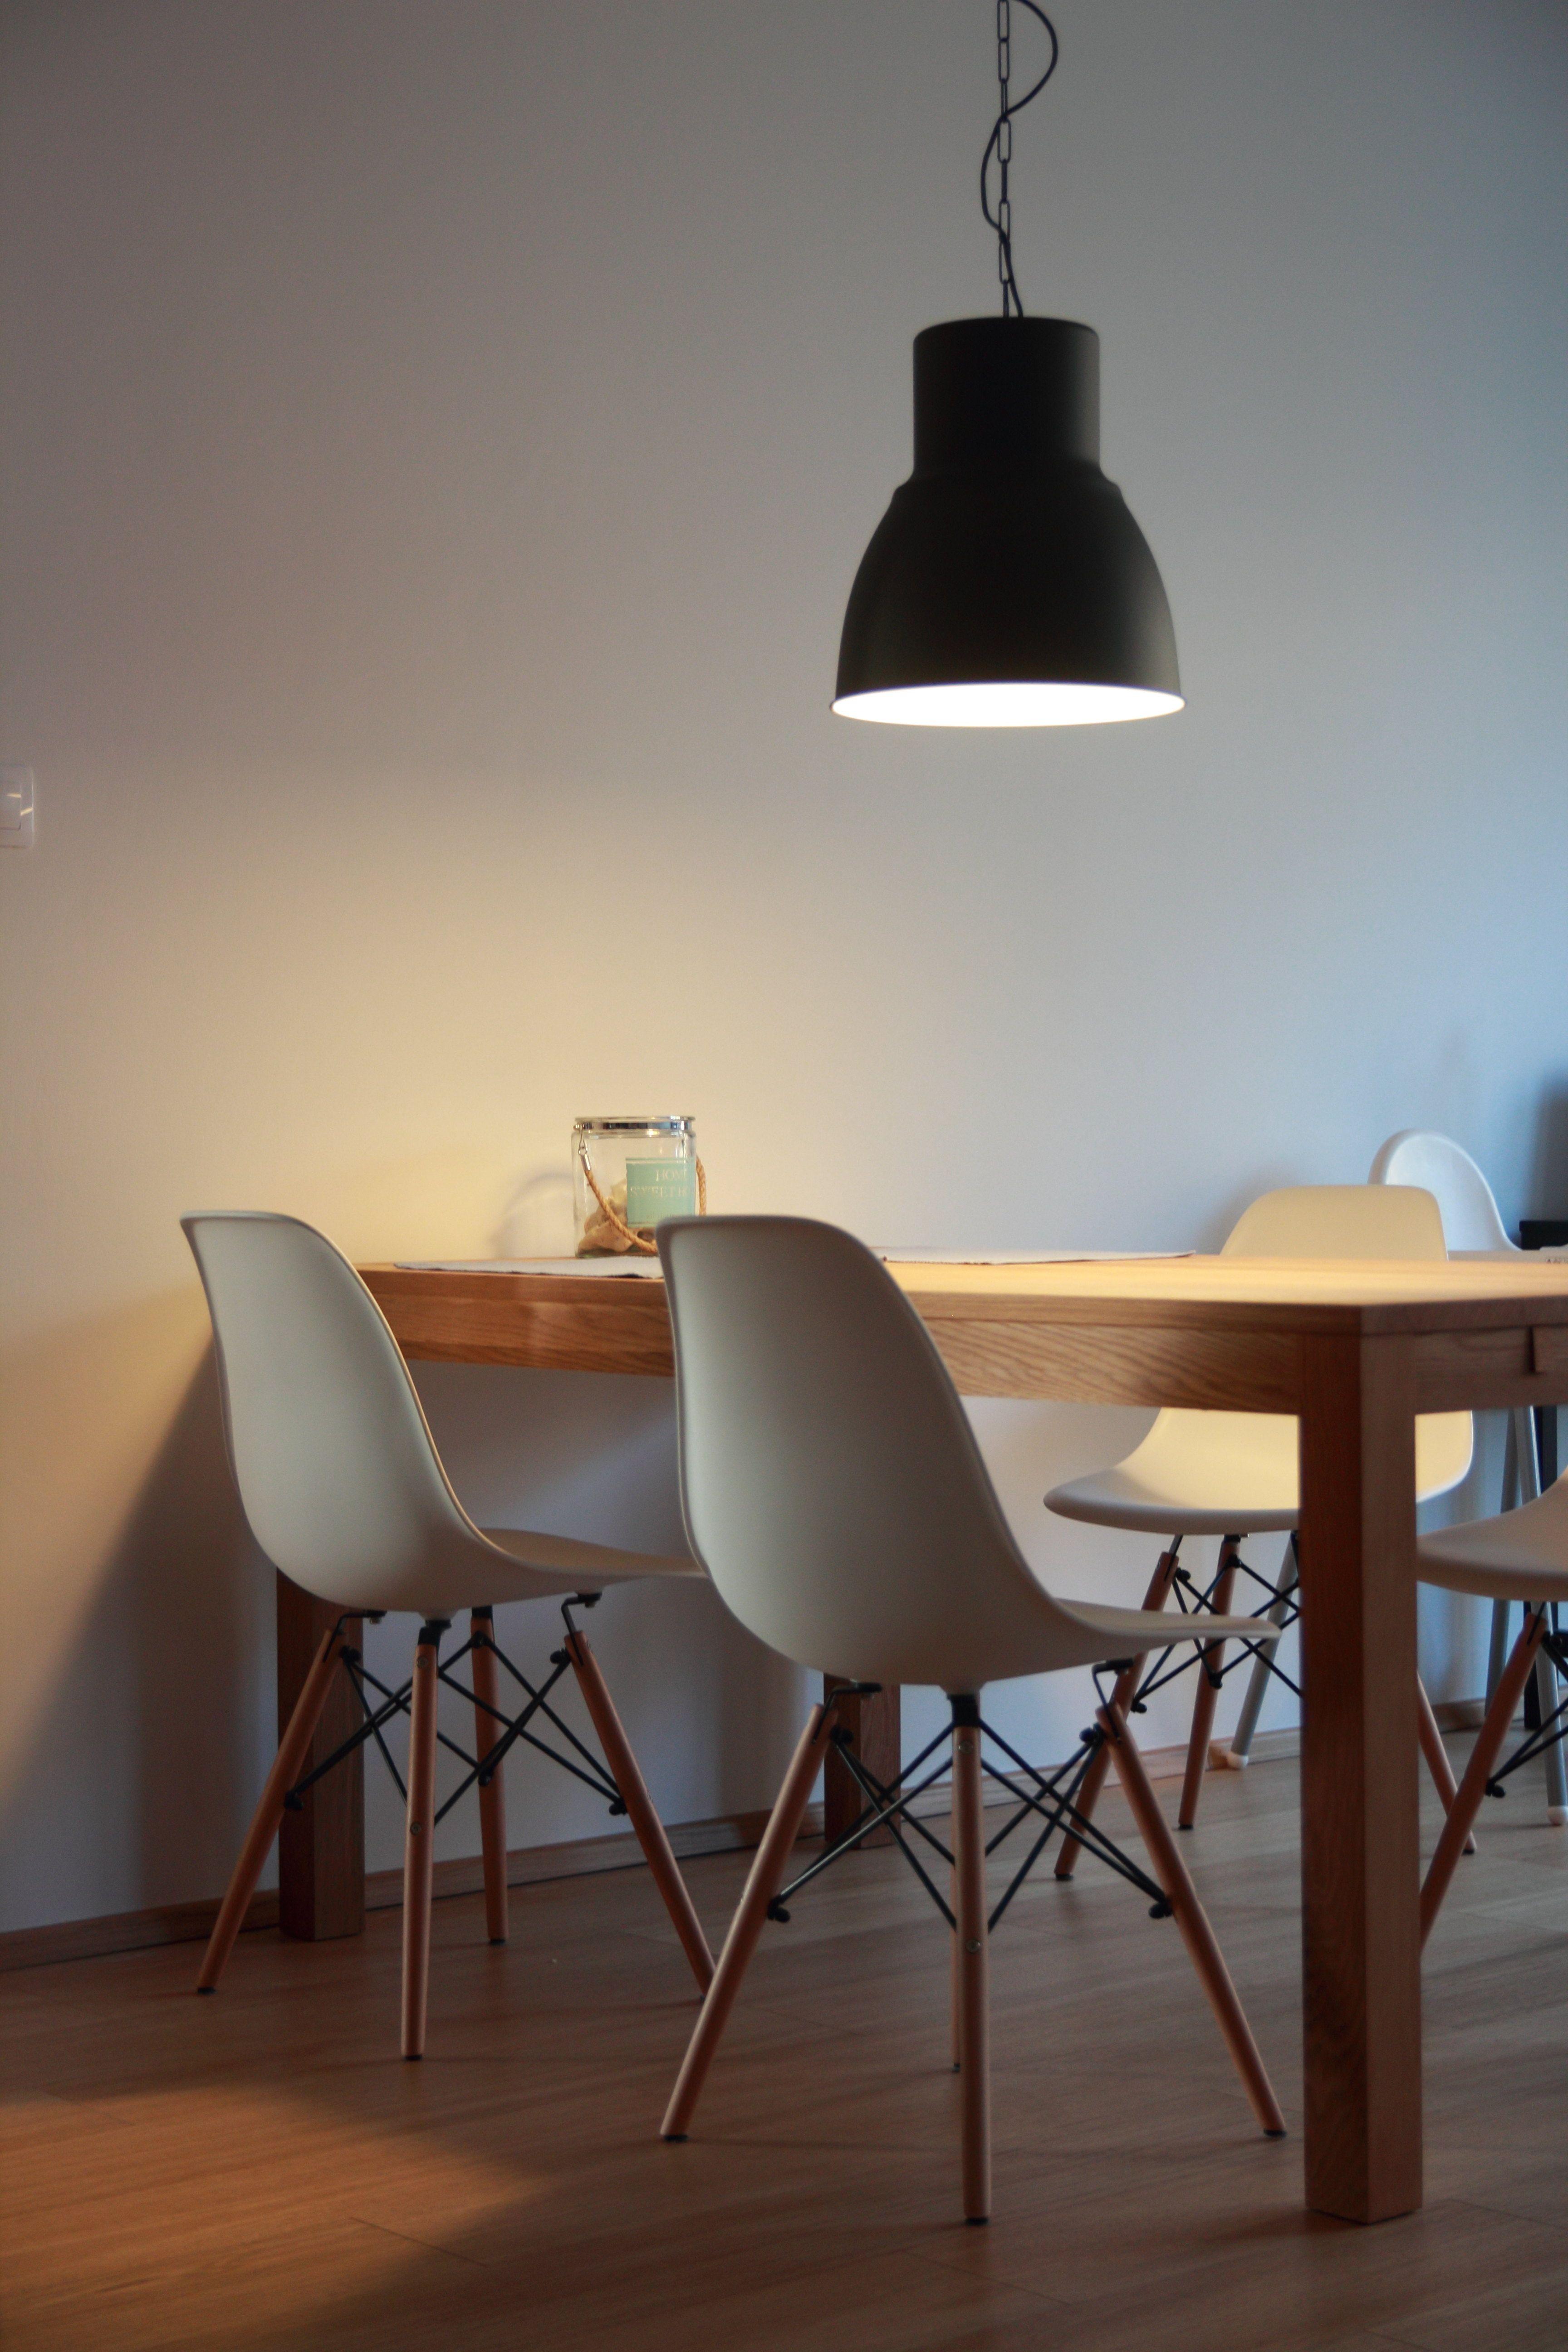 Desk Chair Jysk Feet Covers Hektar Lamp Dark Grey 38 Cm Ikea Oak Table